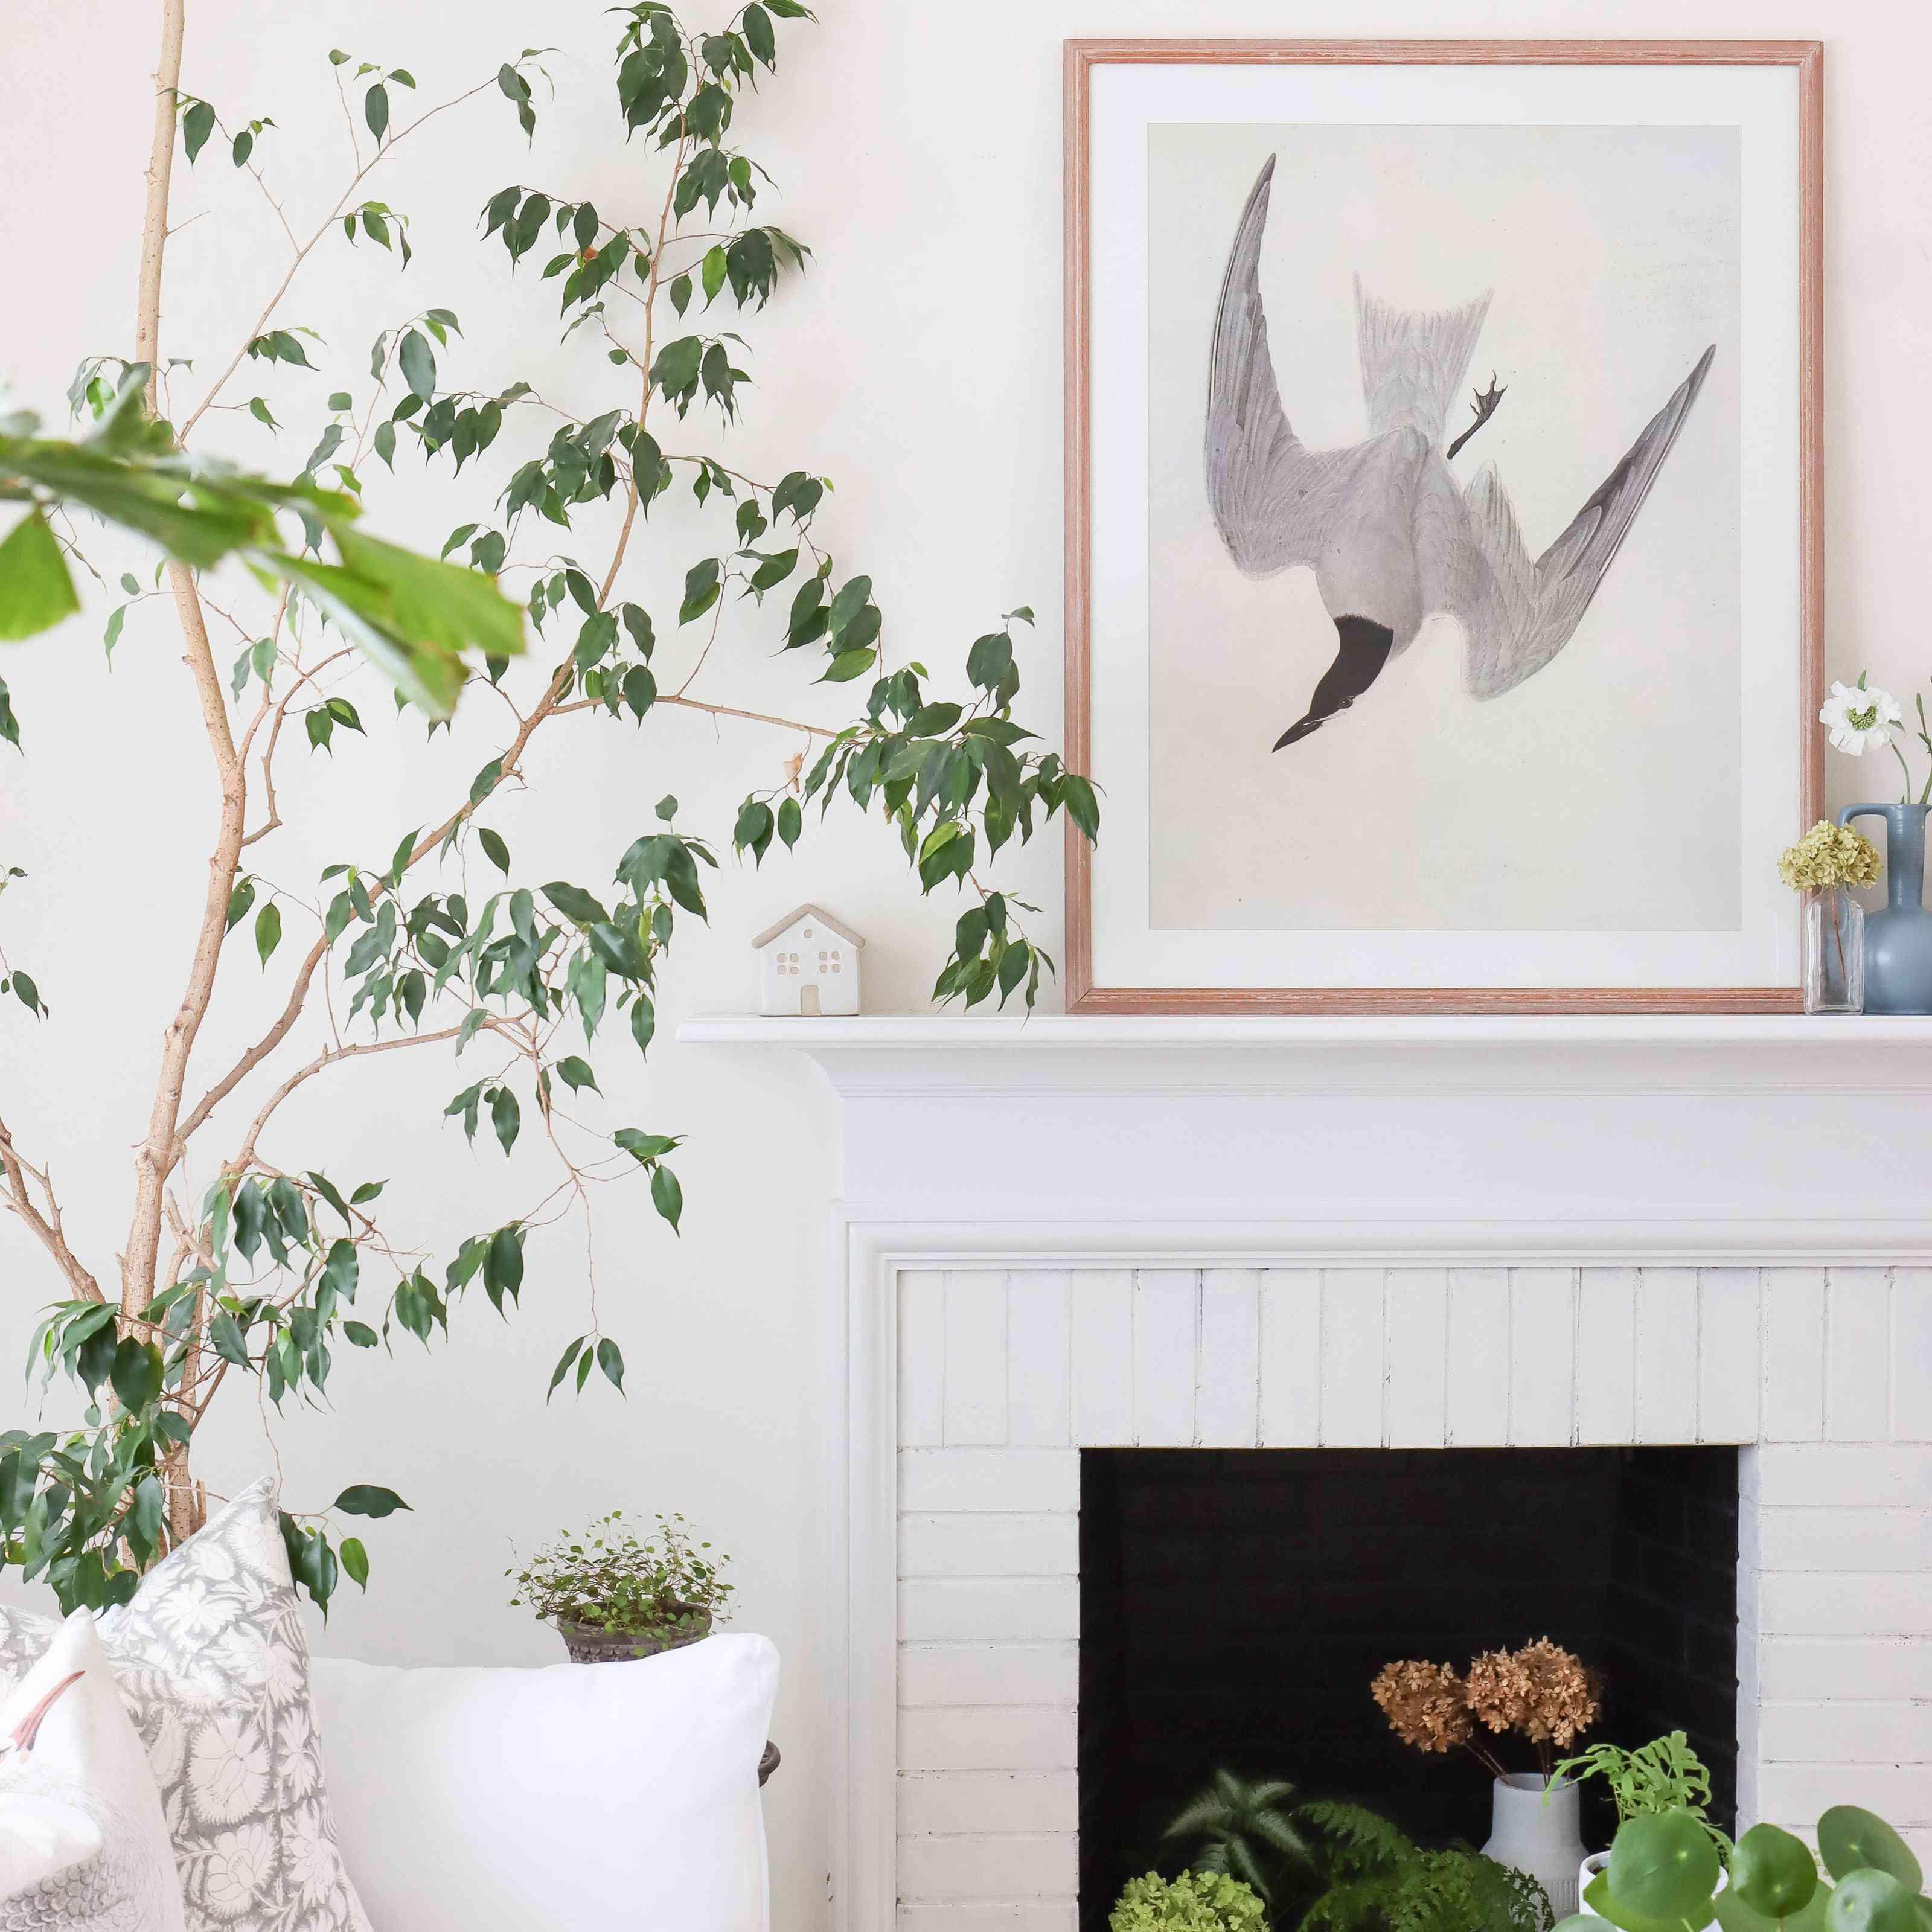 Large art piece of a bird above a fire[lace mantel.